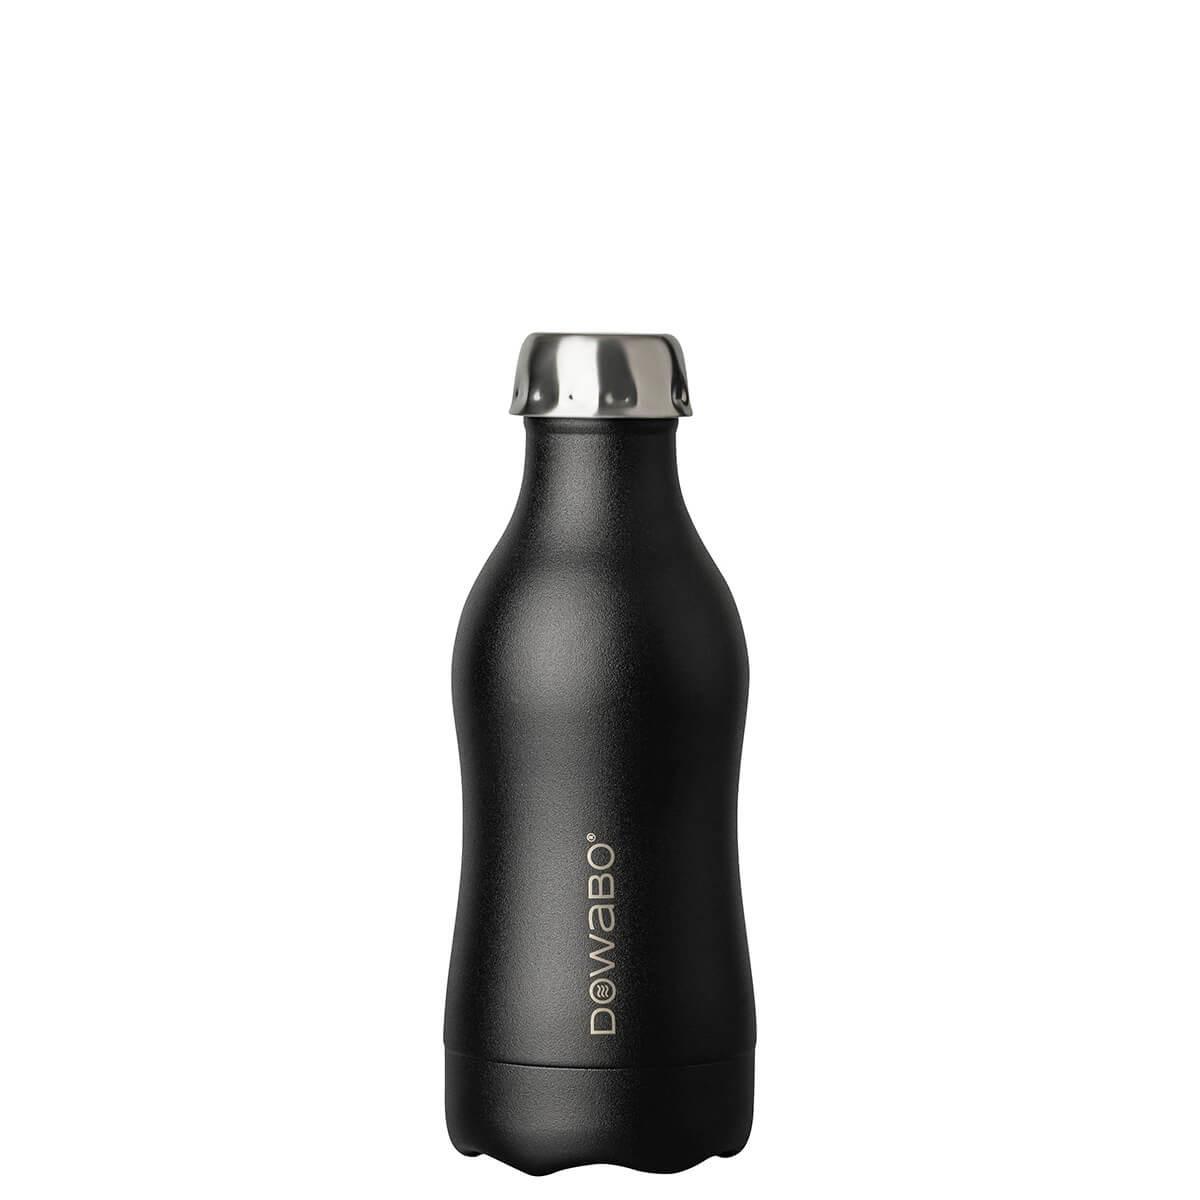 DOWABO® Bottle - Black Sun 350ml Cocktail Collection